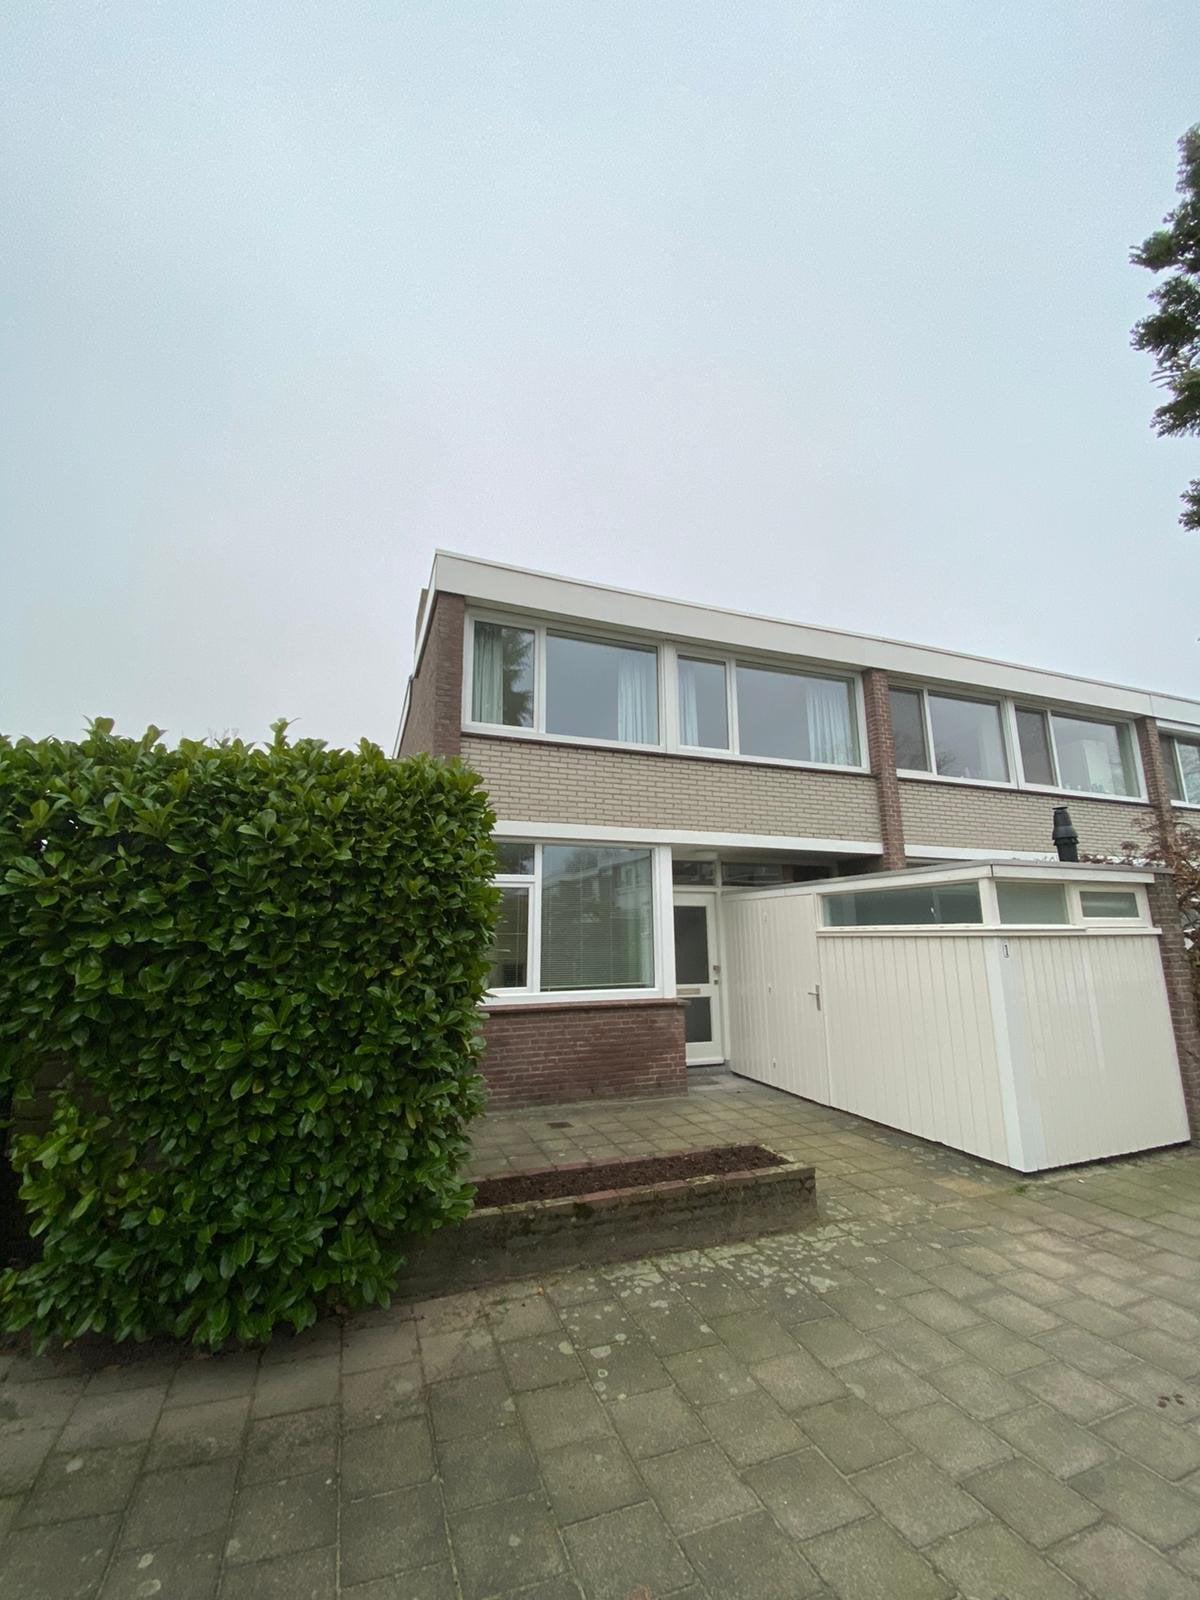 Eindhoven, Dardanuspad